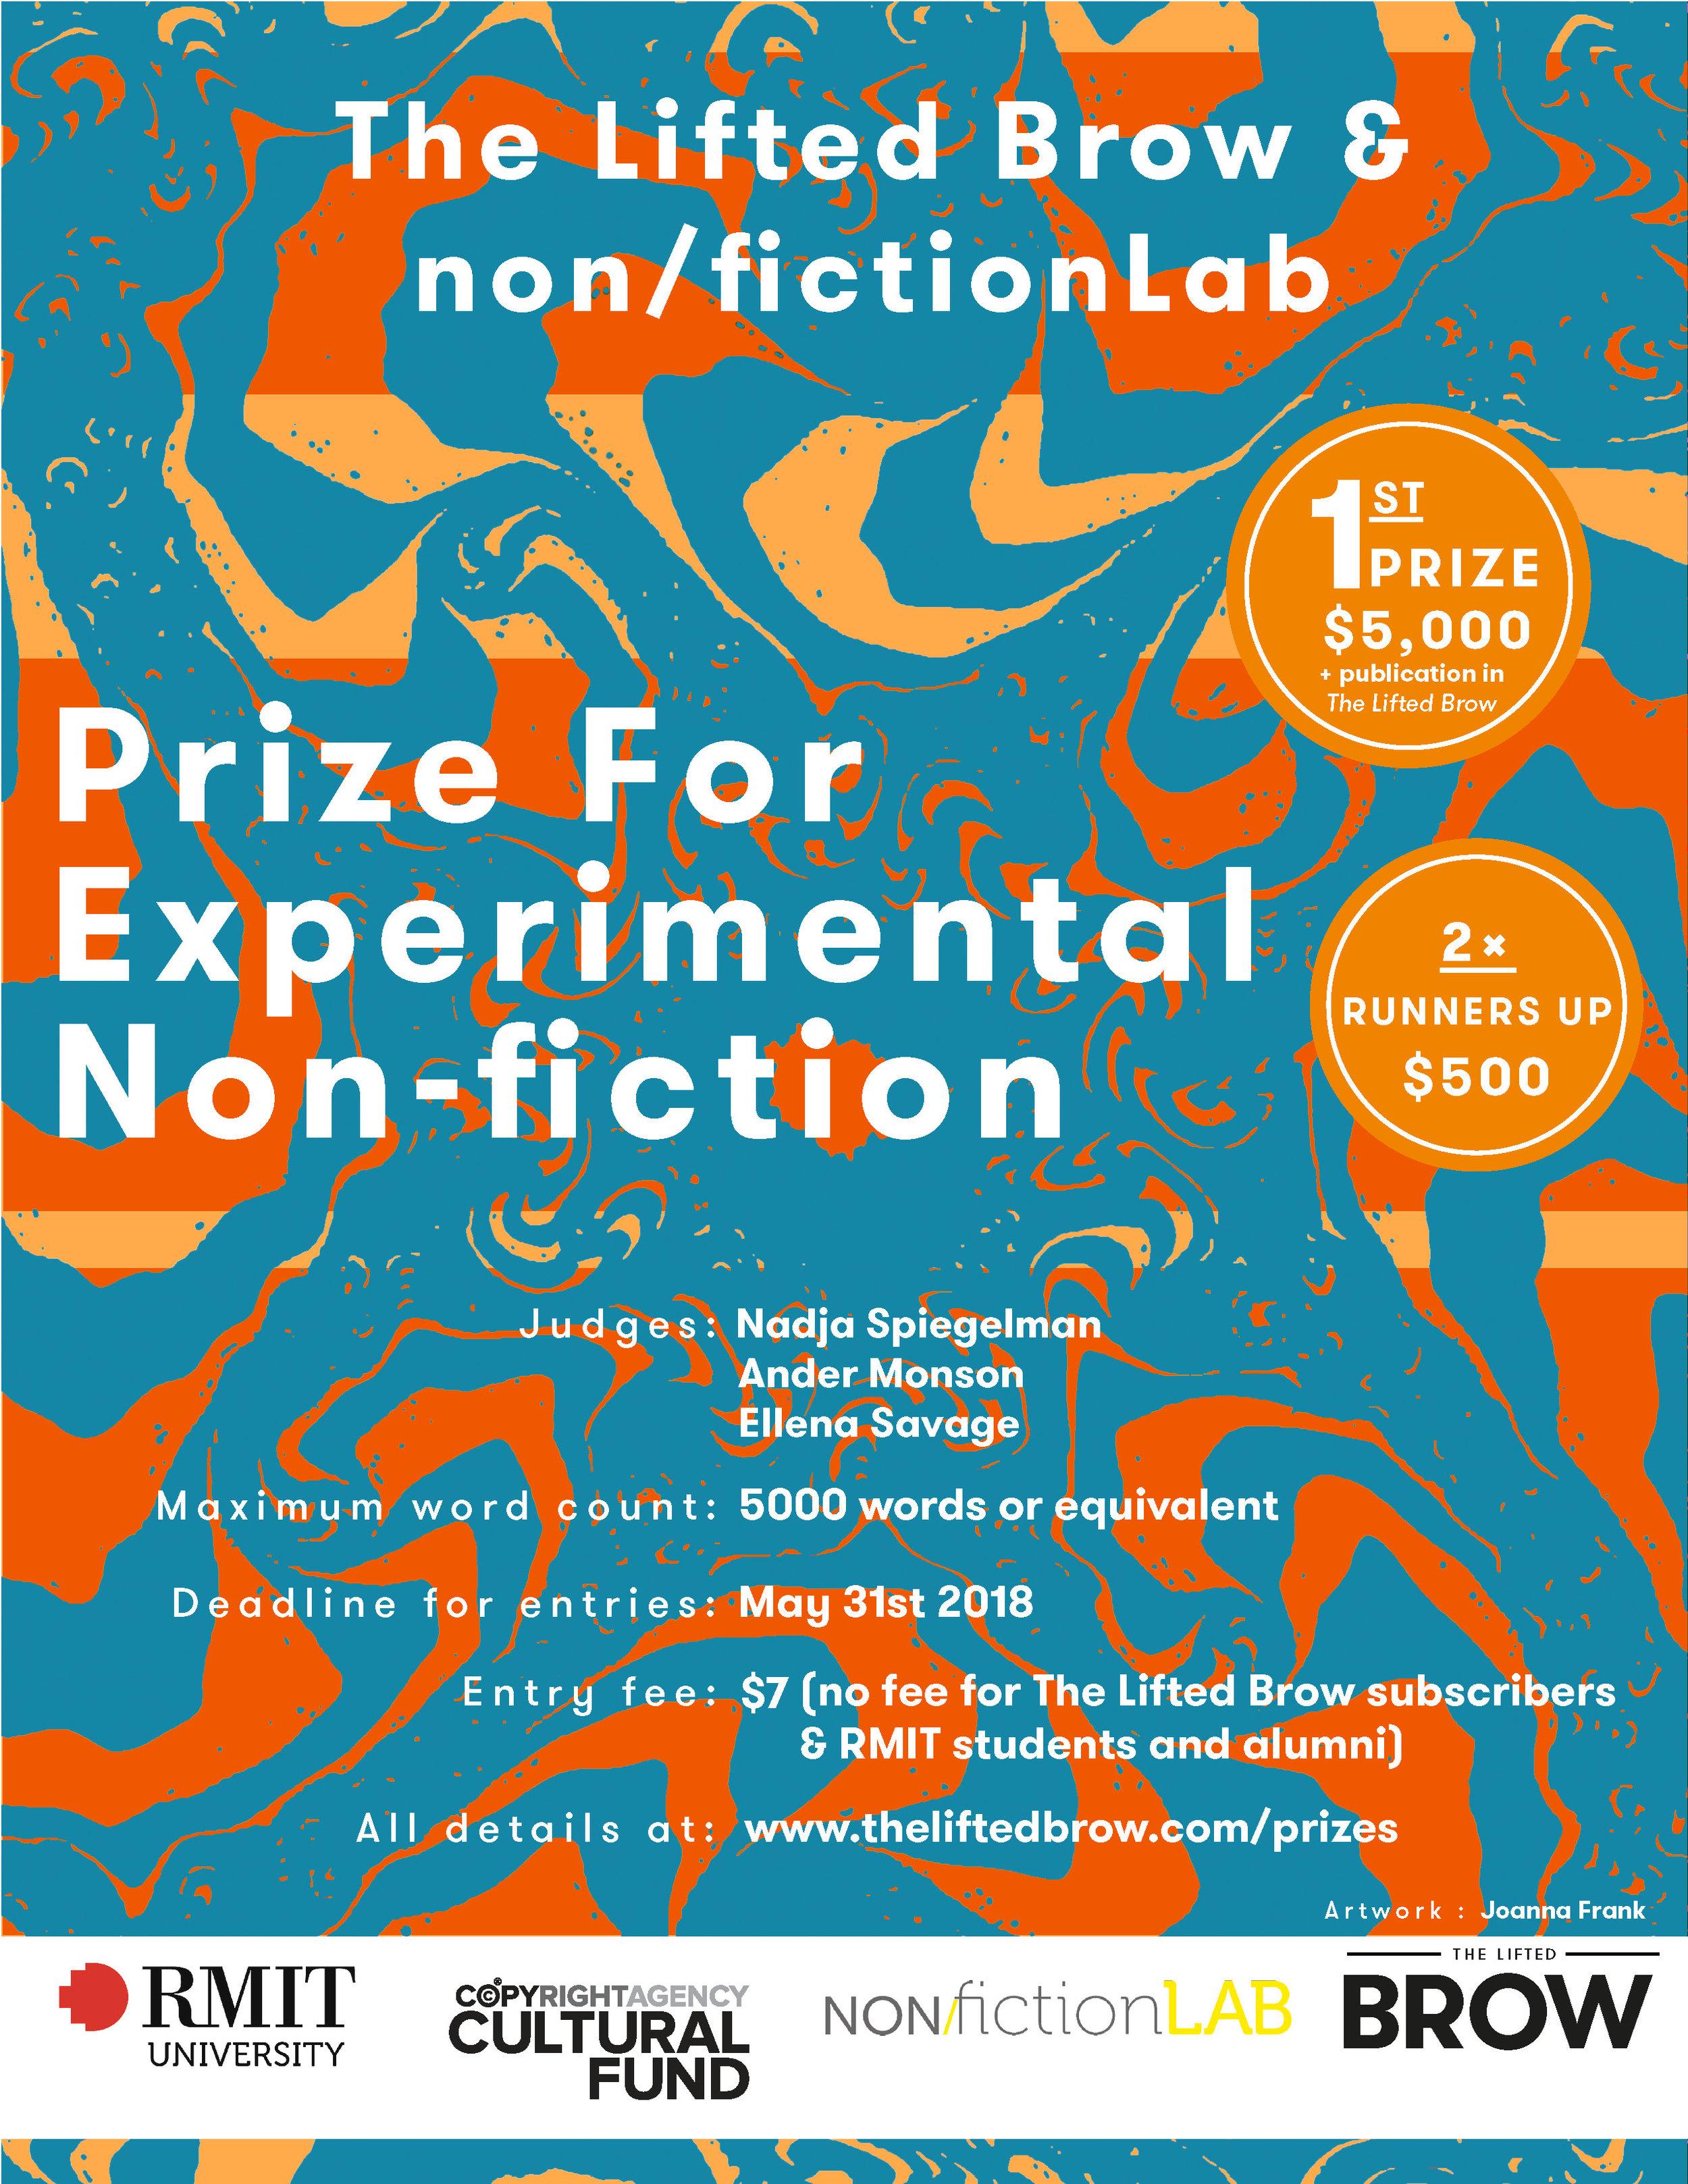 ExperimentalNon-FictionPrize_2018 - poster.jpg